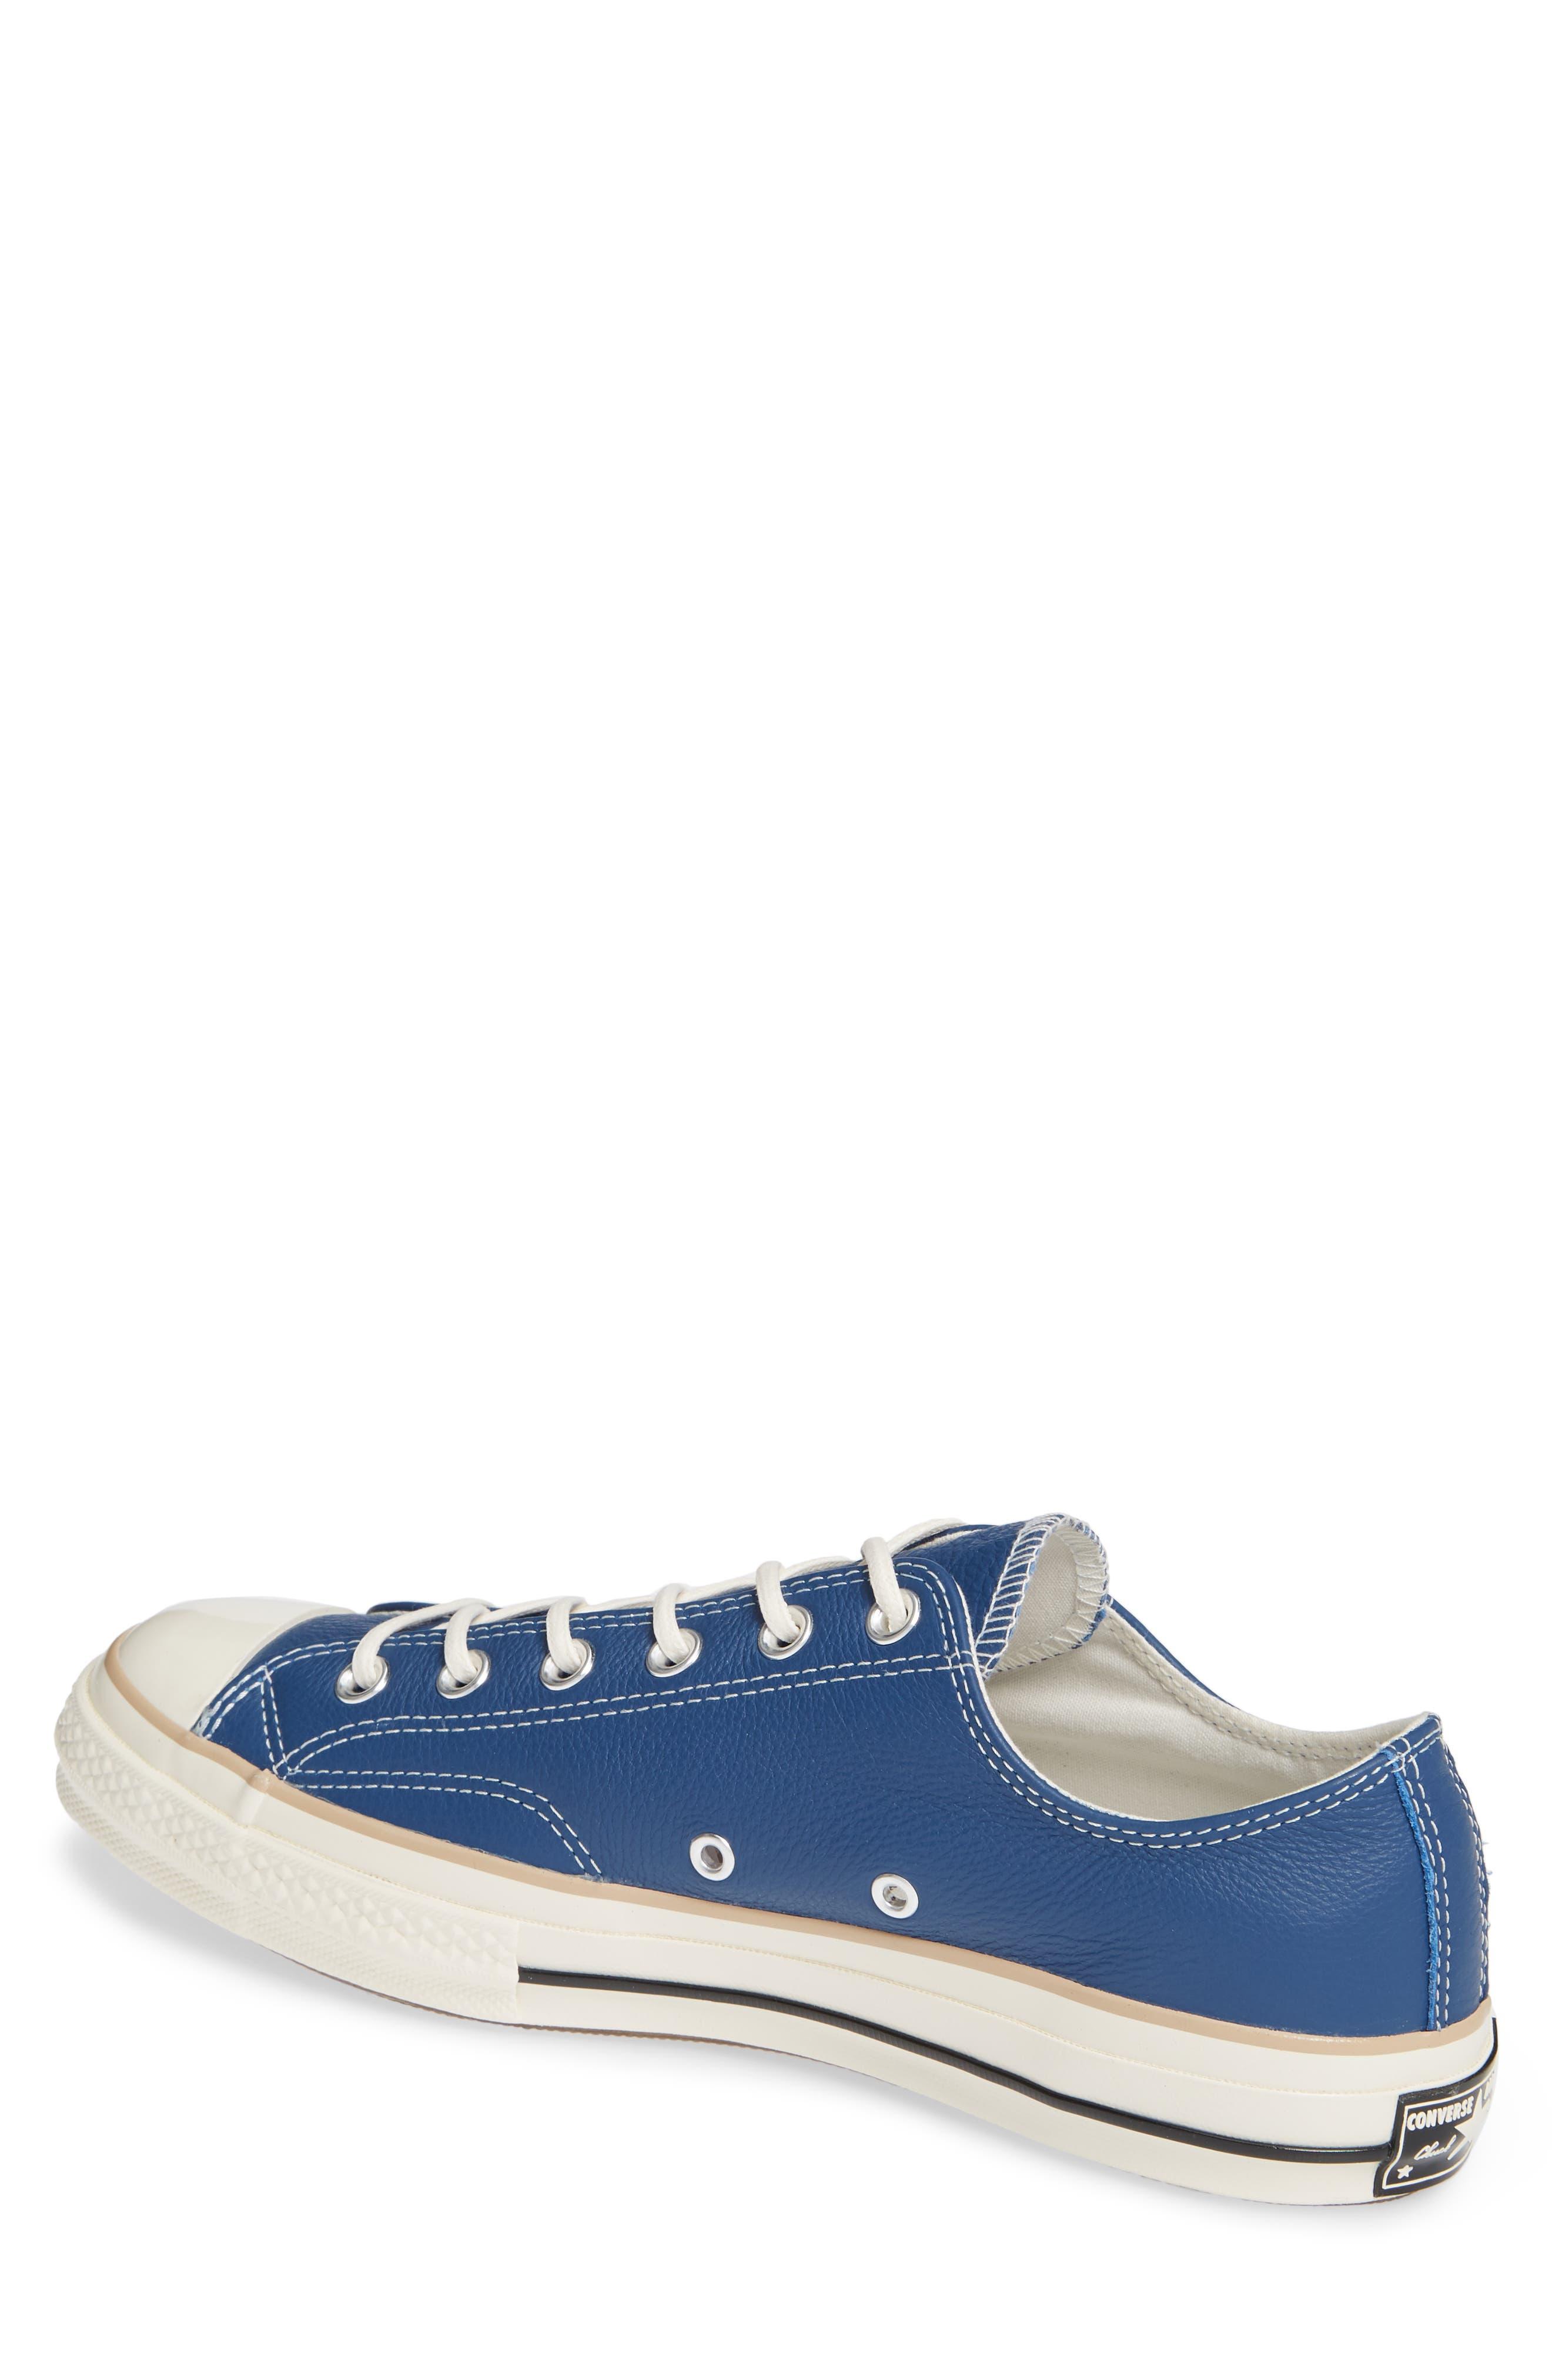 Chuck 70 Boot Leather Low Top Sneaker,                             Alternate thumbnail 2, color,                             DARK BURGUNDY/ CYAN/ EGRET